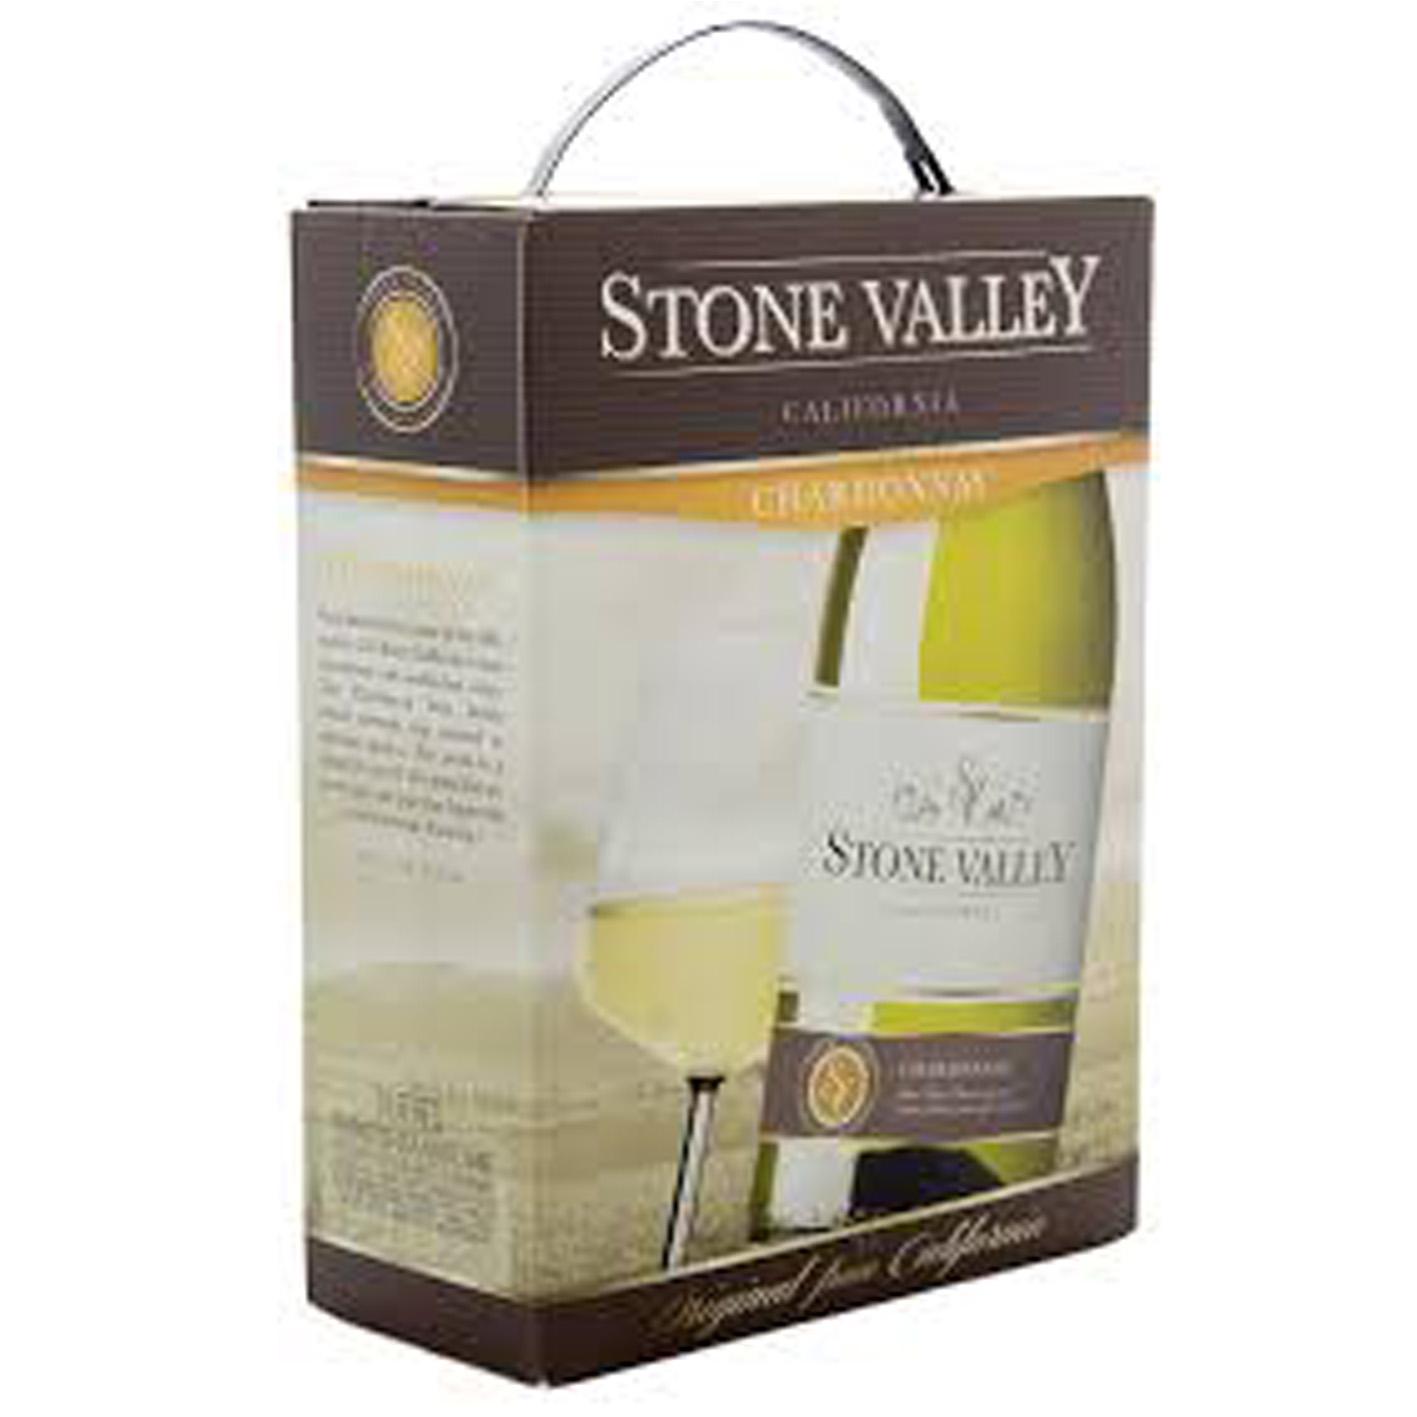 STONE VALLEY Chardonnay 3l